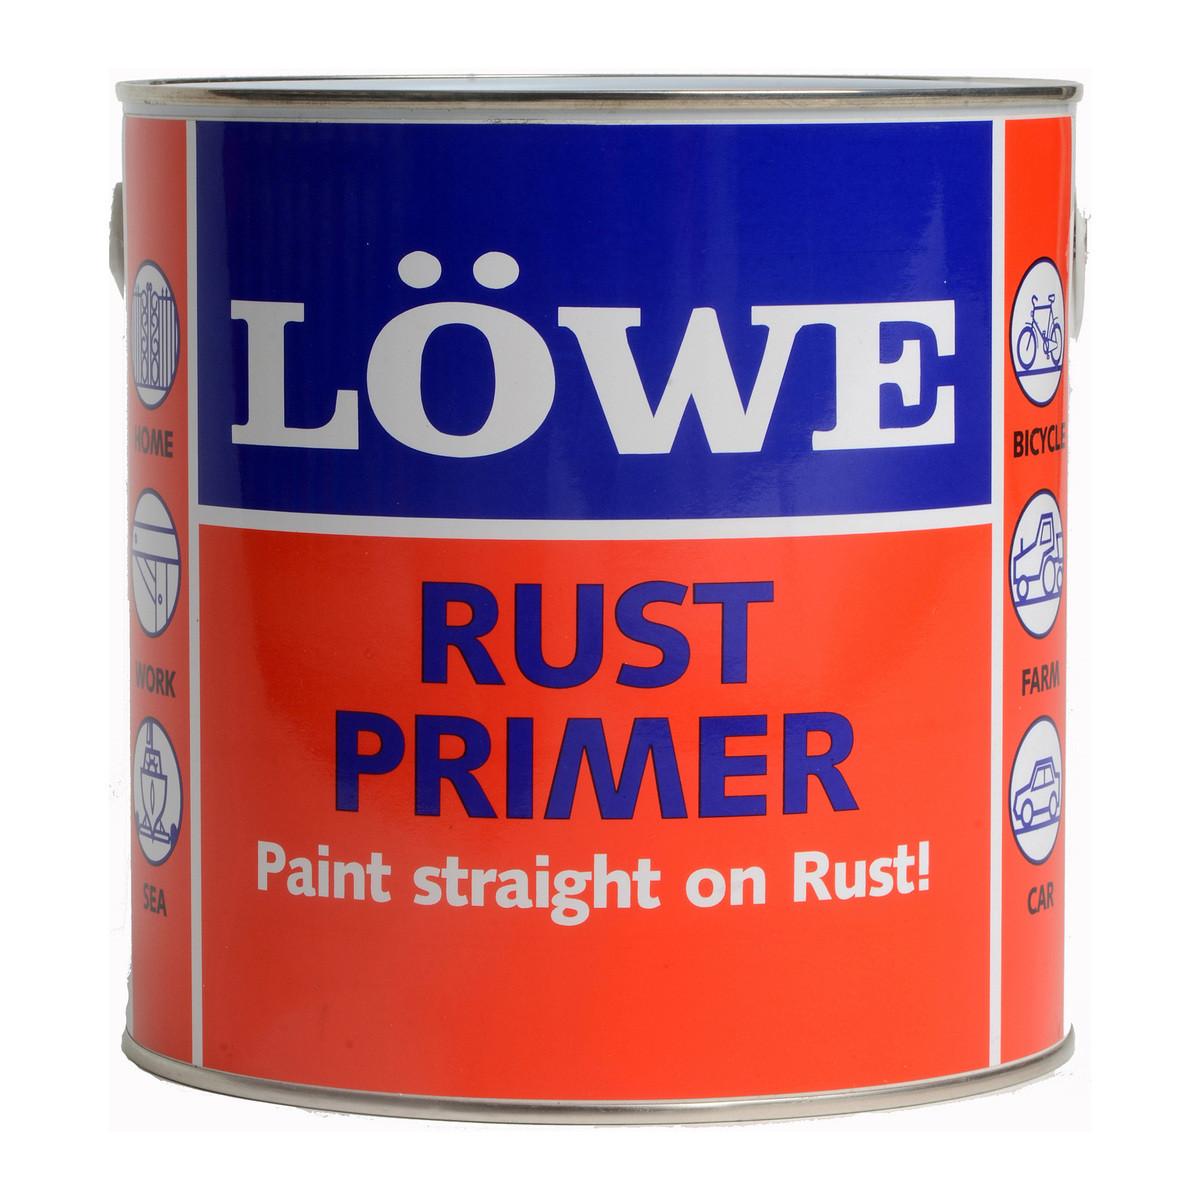 Lowe Rust Primer Tile Red 750g